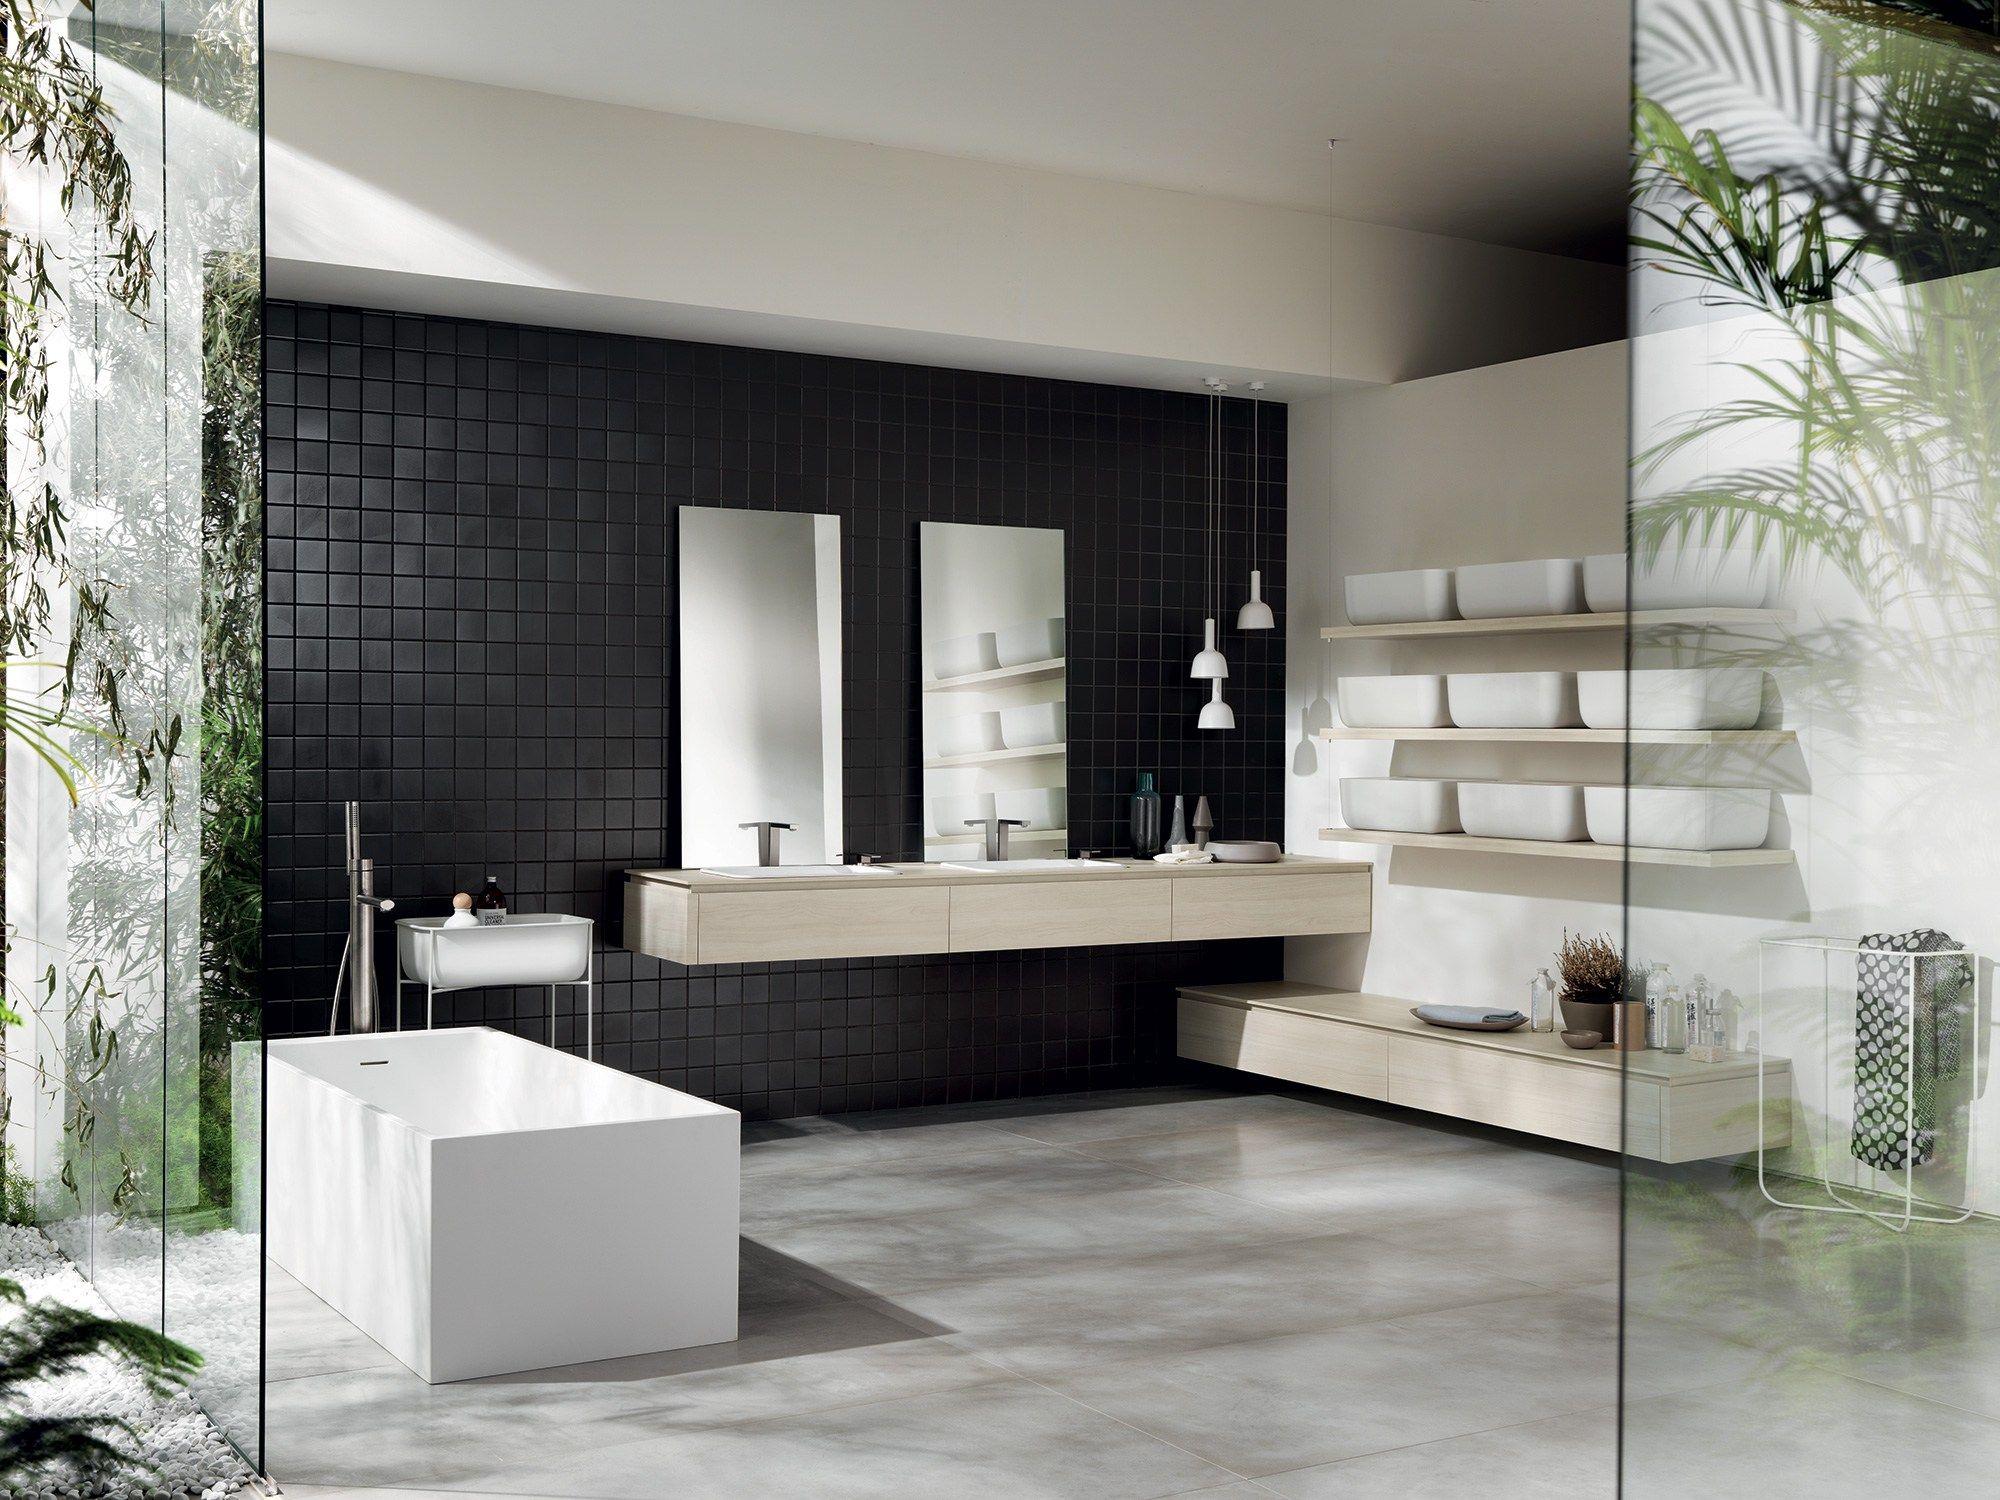 Badezimmer-Ausstattung KI by Scavolini Bathrooms Design Nendo ...